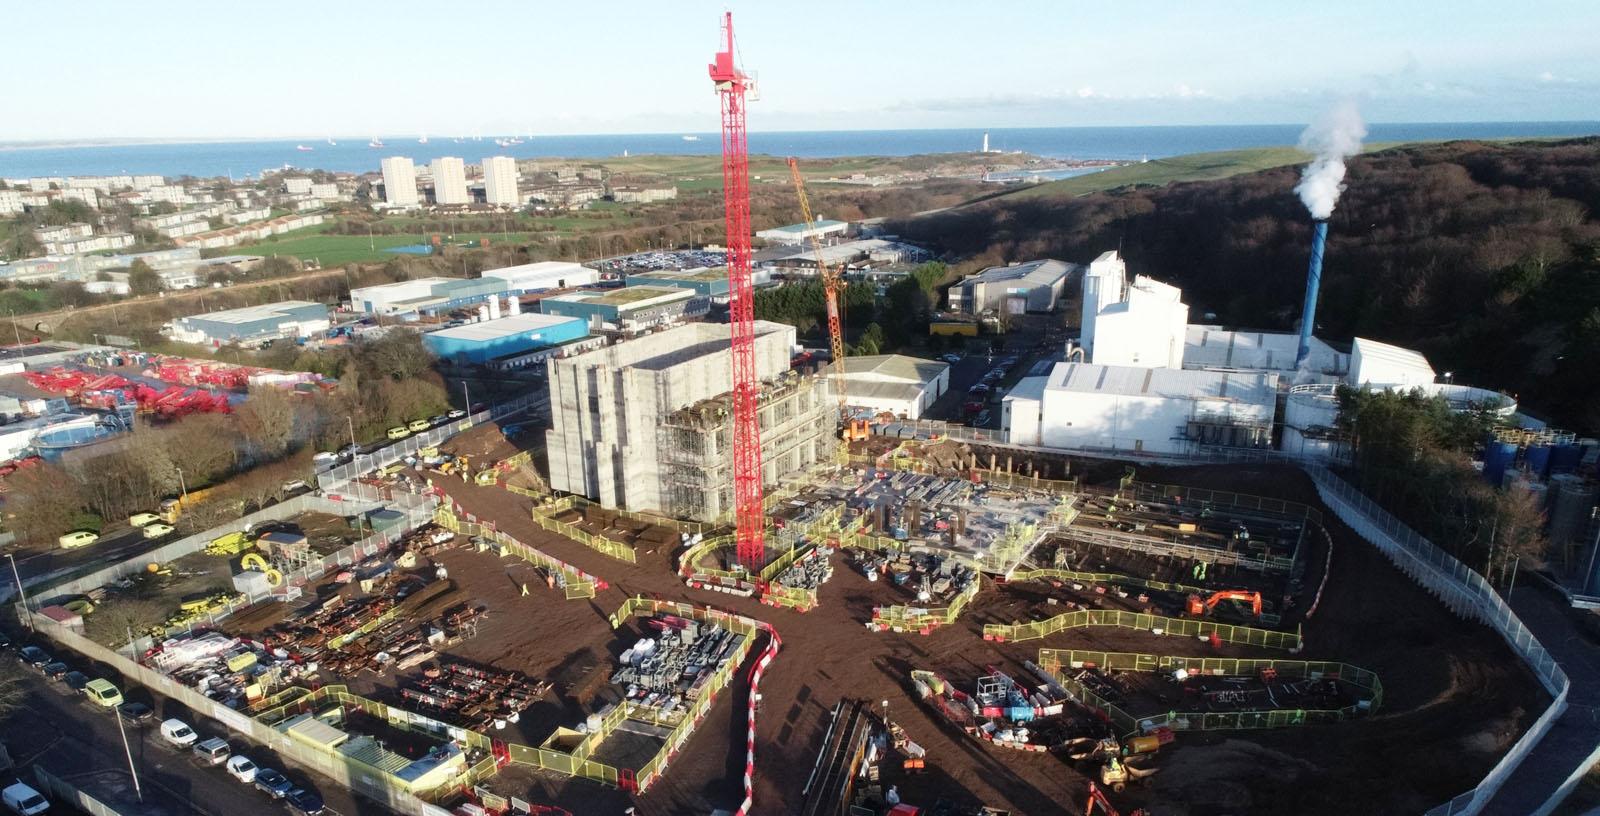 Ness_Energy_Project_Scotland_UK_Acciona_IDOM_00